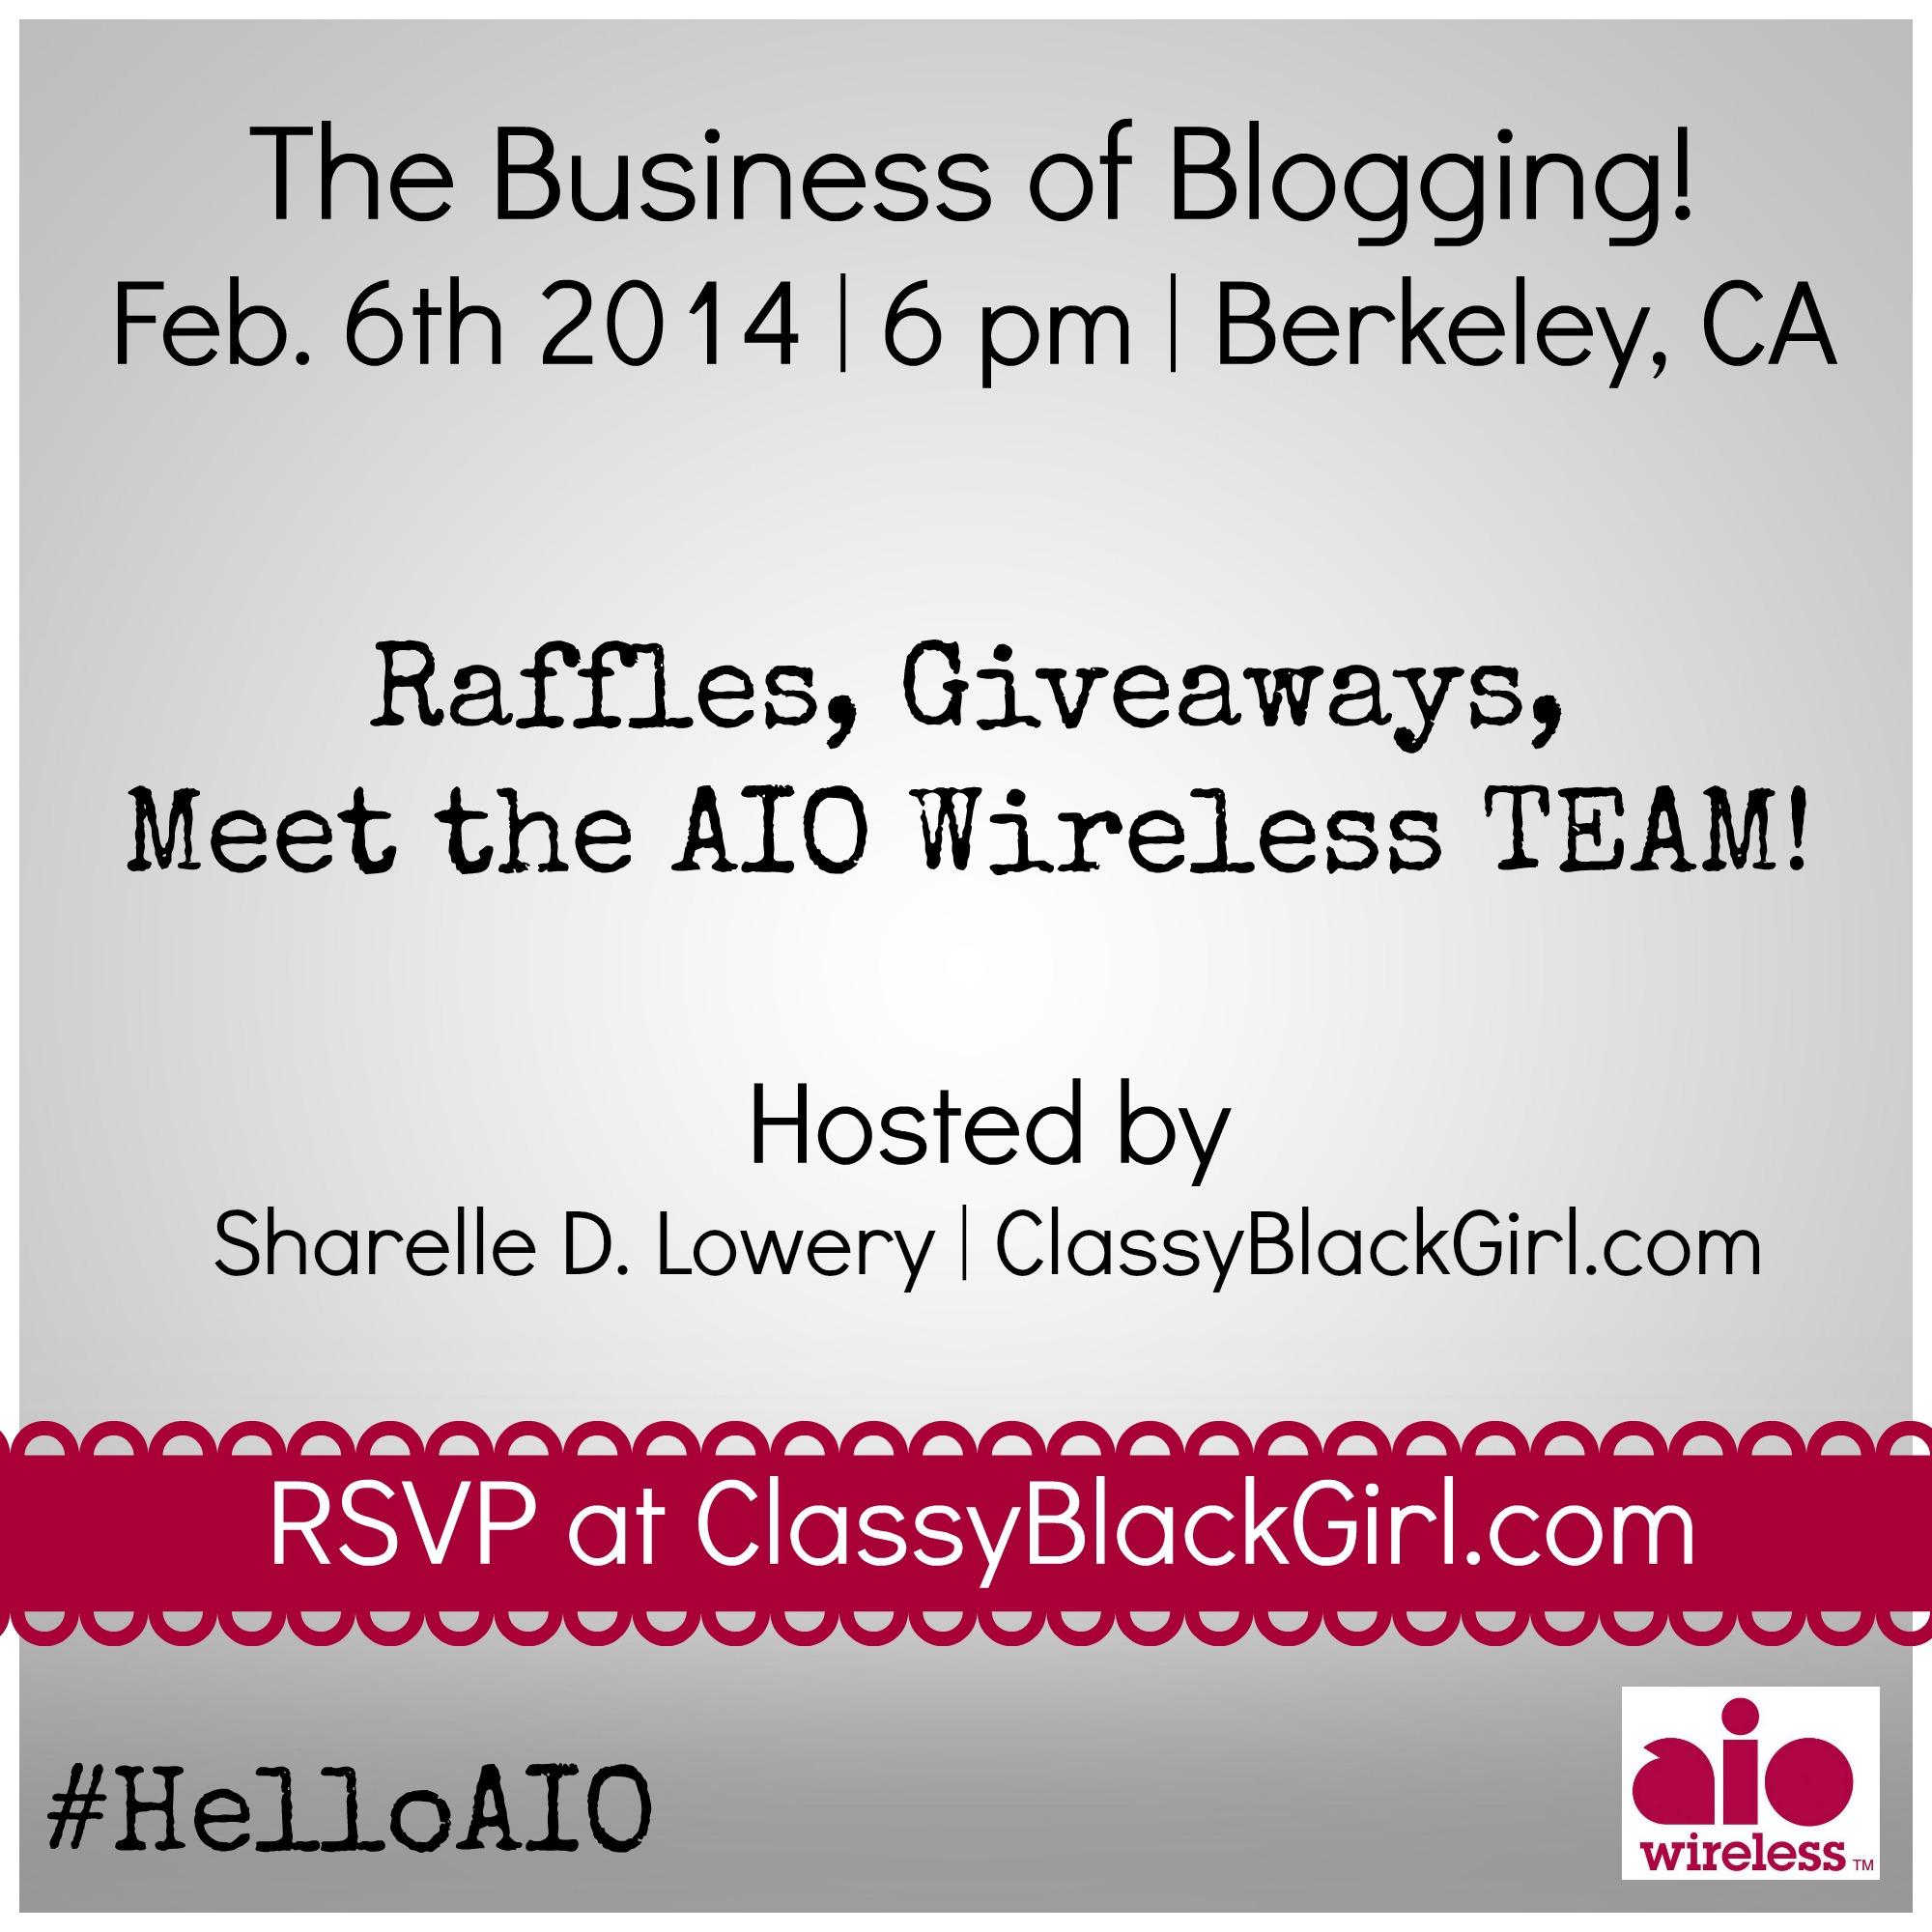 business of blogging AIO Wireless ClassyBlackGirl